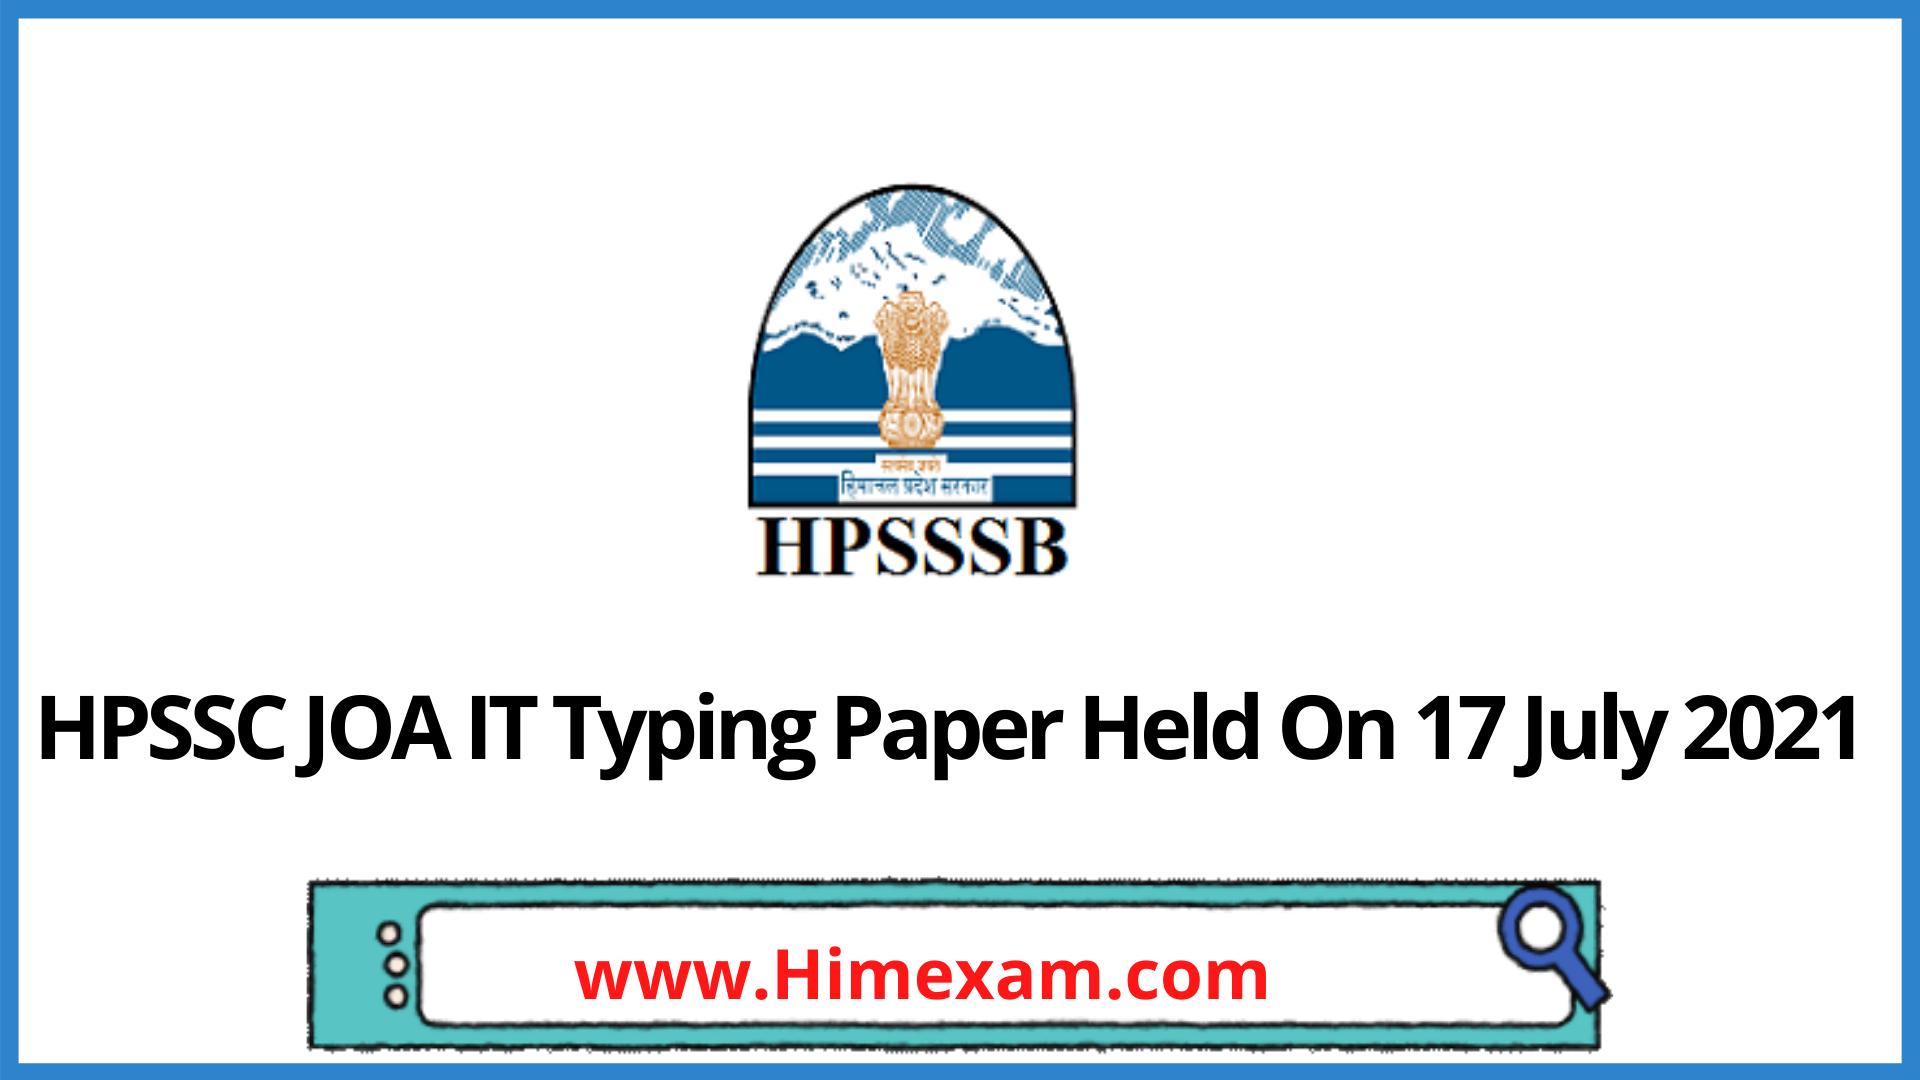 HPSSC JOA IT Typing Paper Held On 17 July 2021